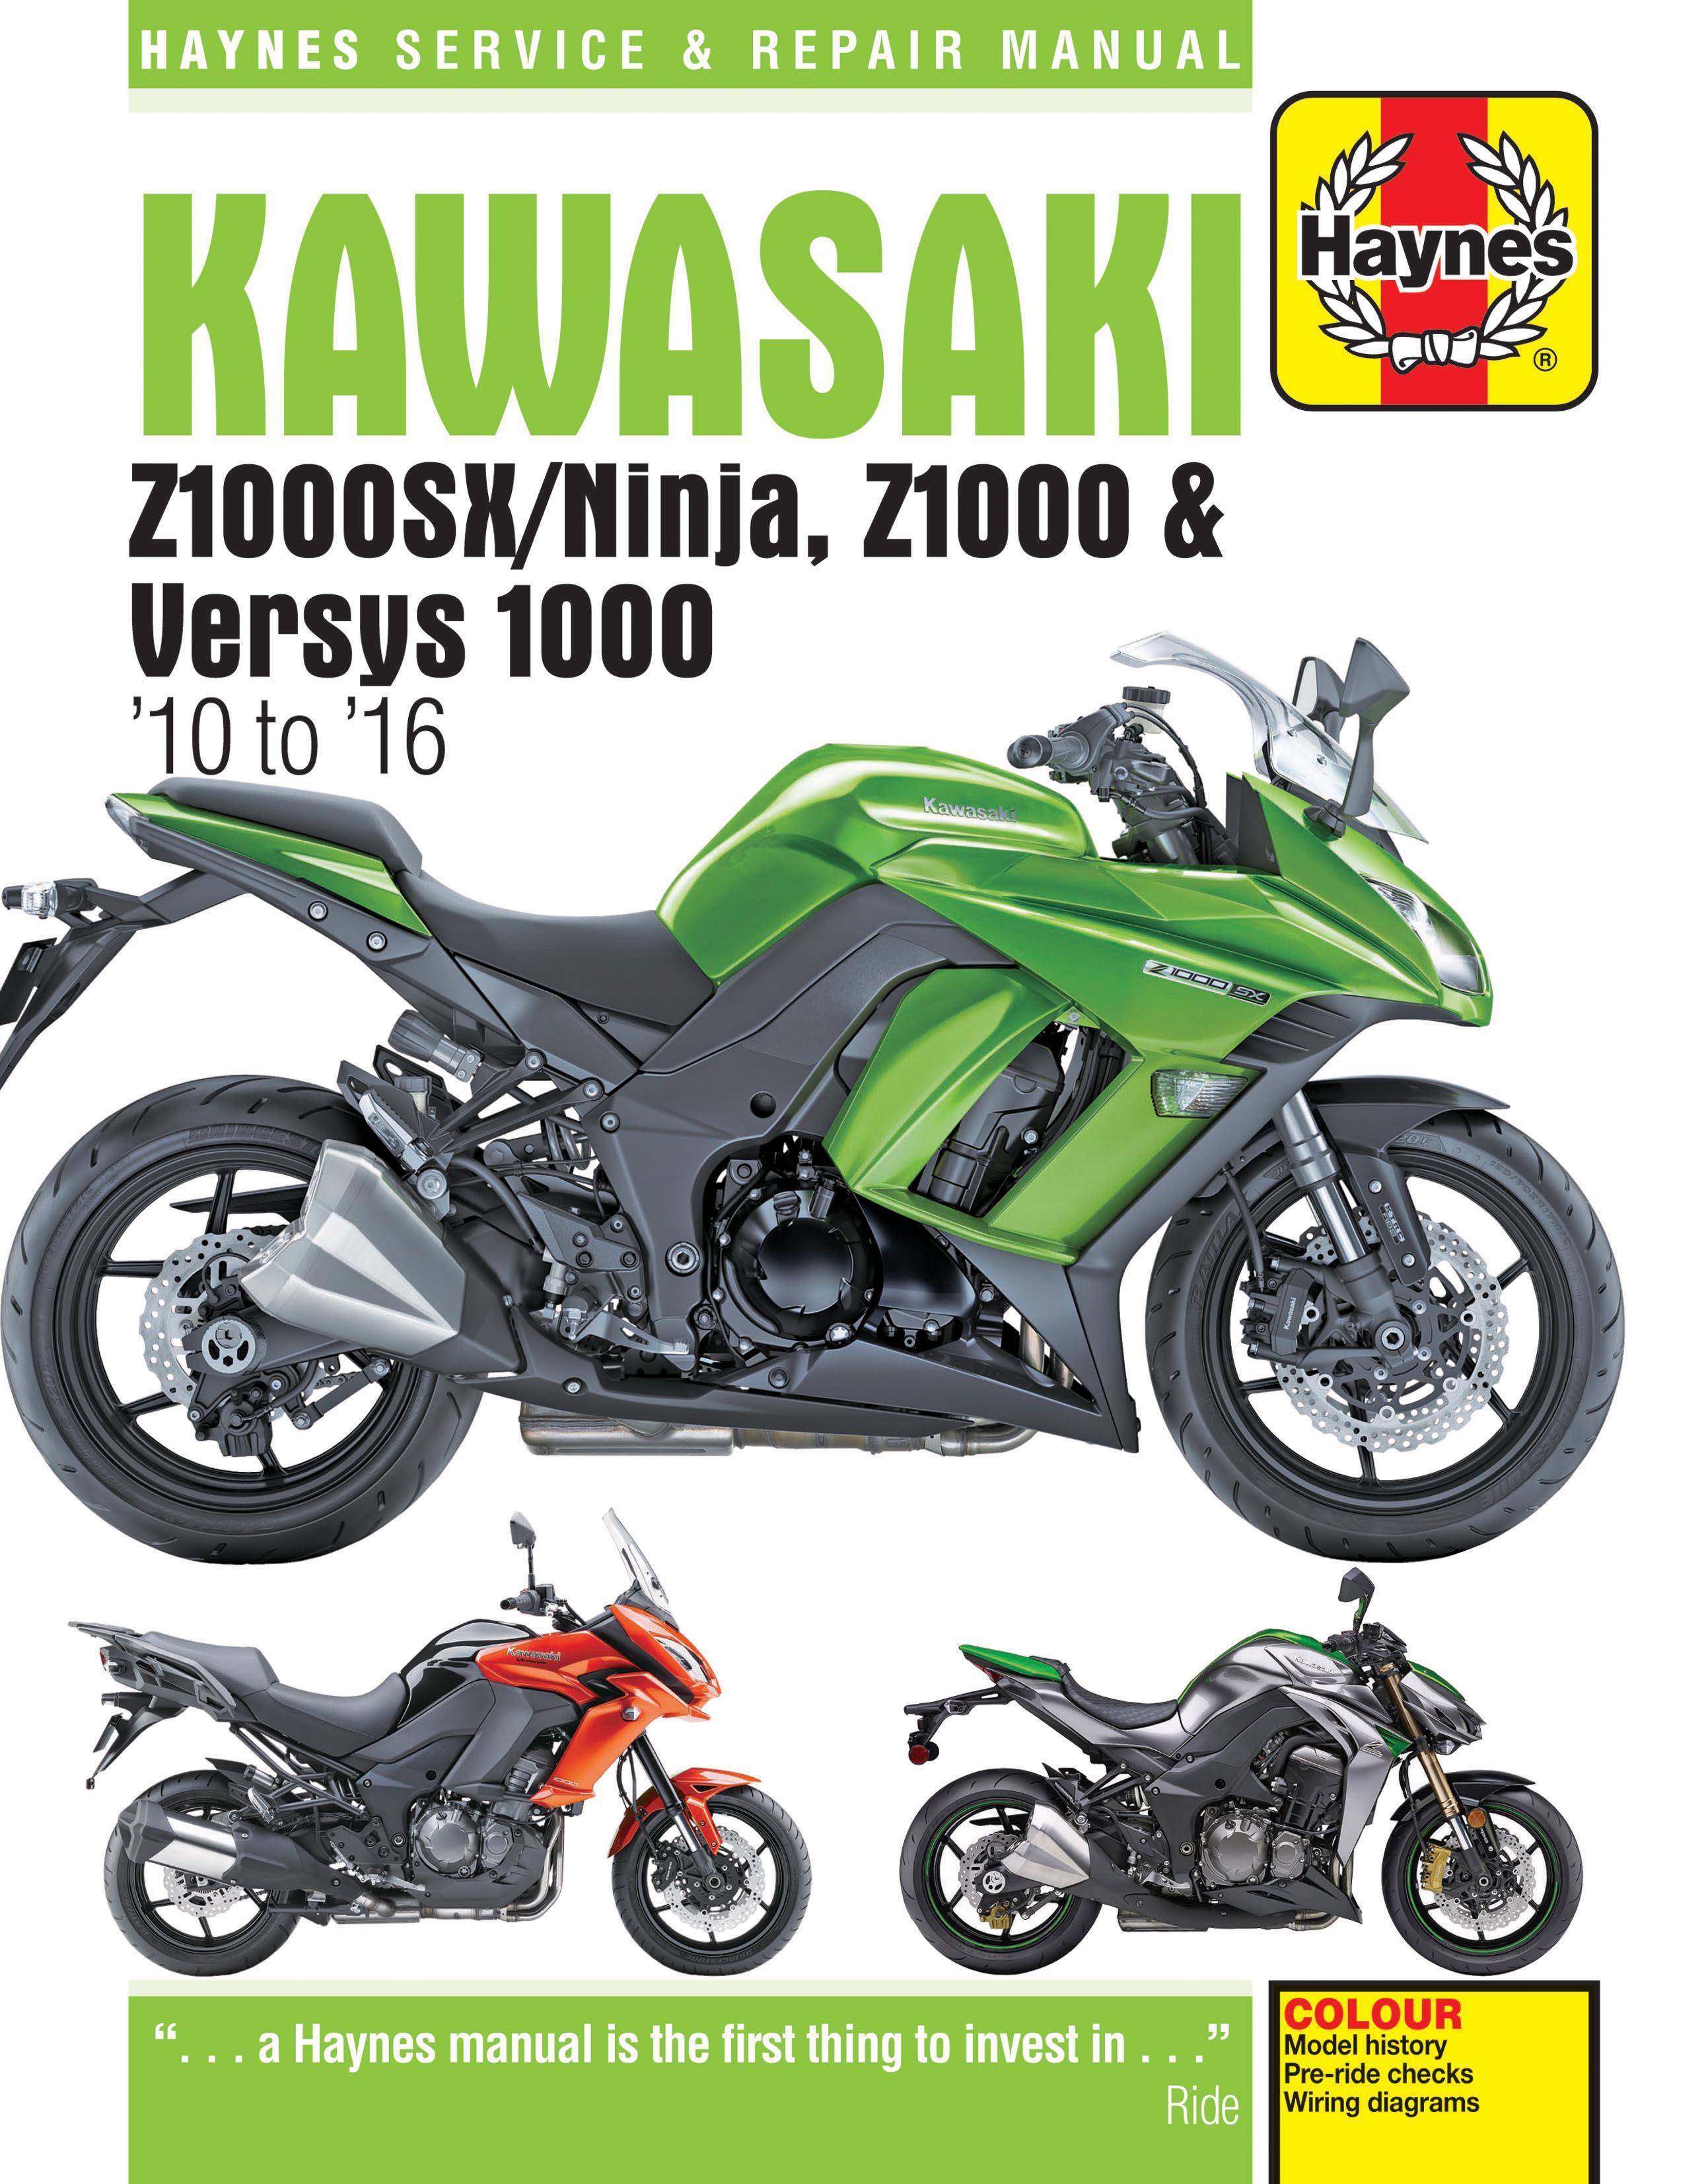 Haynes Kawasaki Z1000sx Ninjaz1000 Versys 1000 10 16service Wiring Diagrams Repair Manual